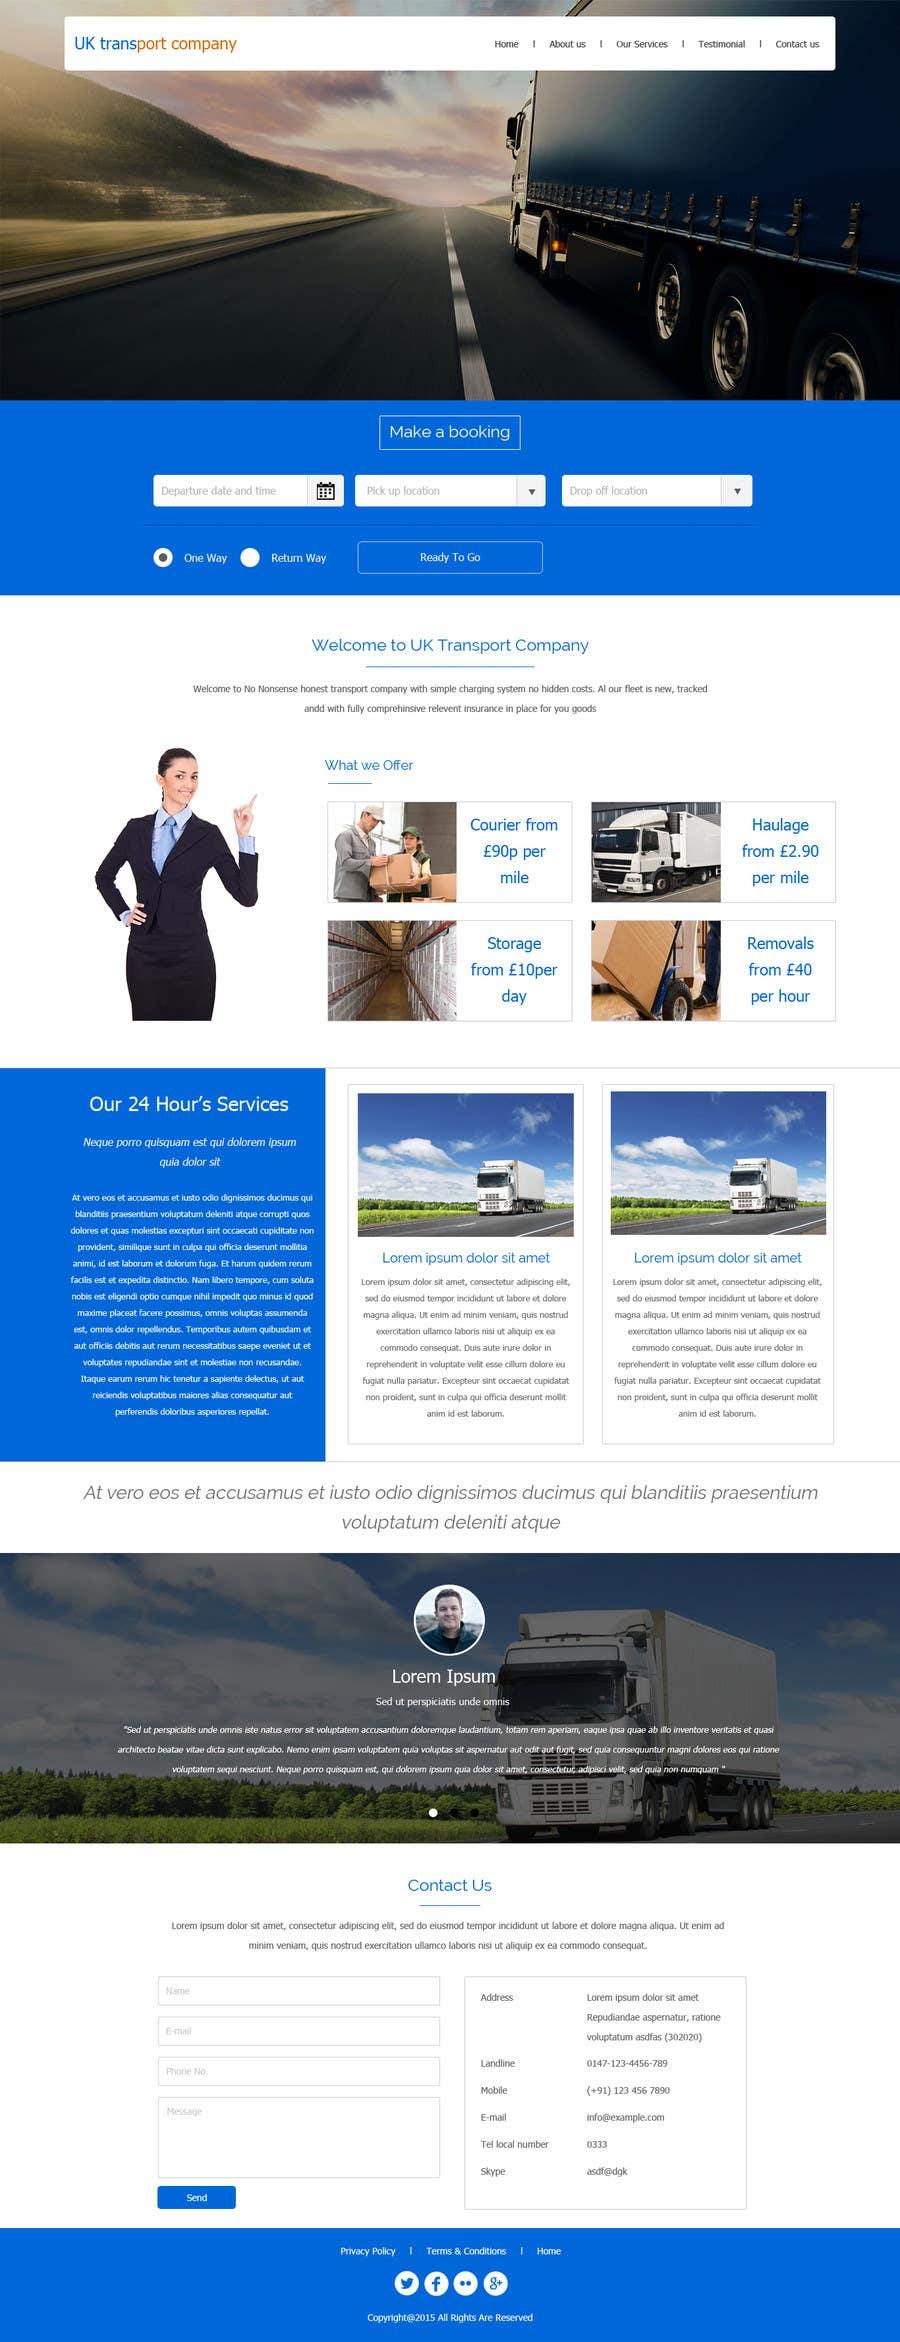 Penyertaan Peraduan #13 untuk Design a Website Mockup Must be user friendly 1 page fun site for tranport company